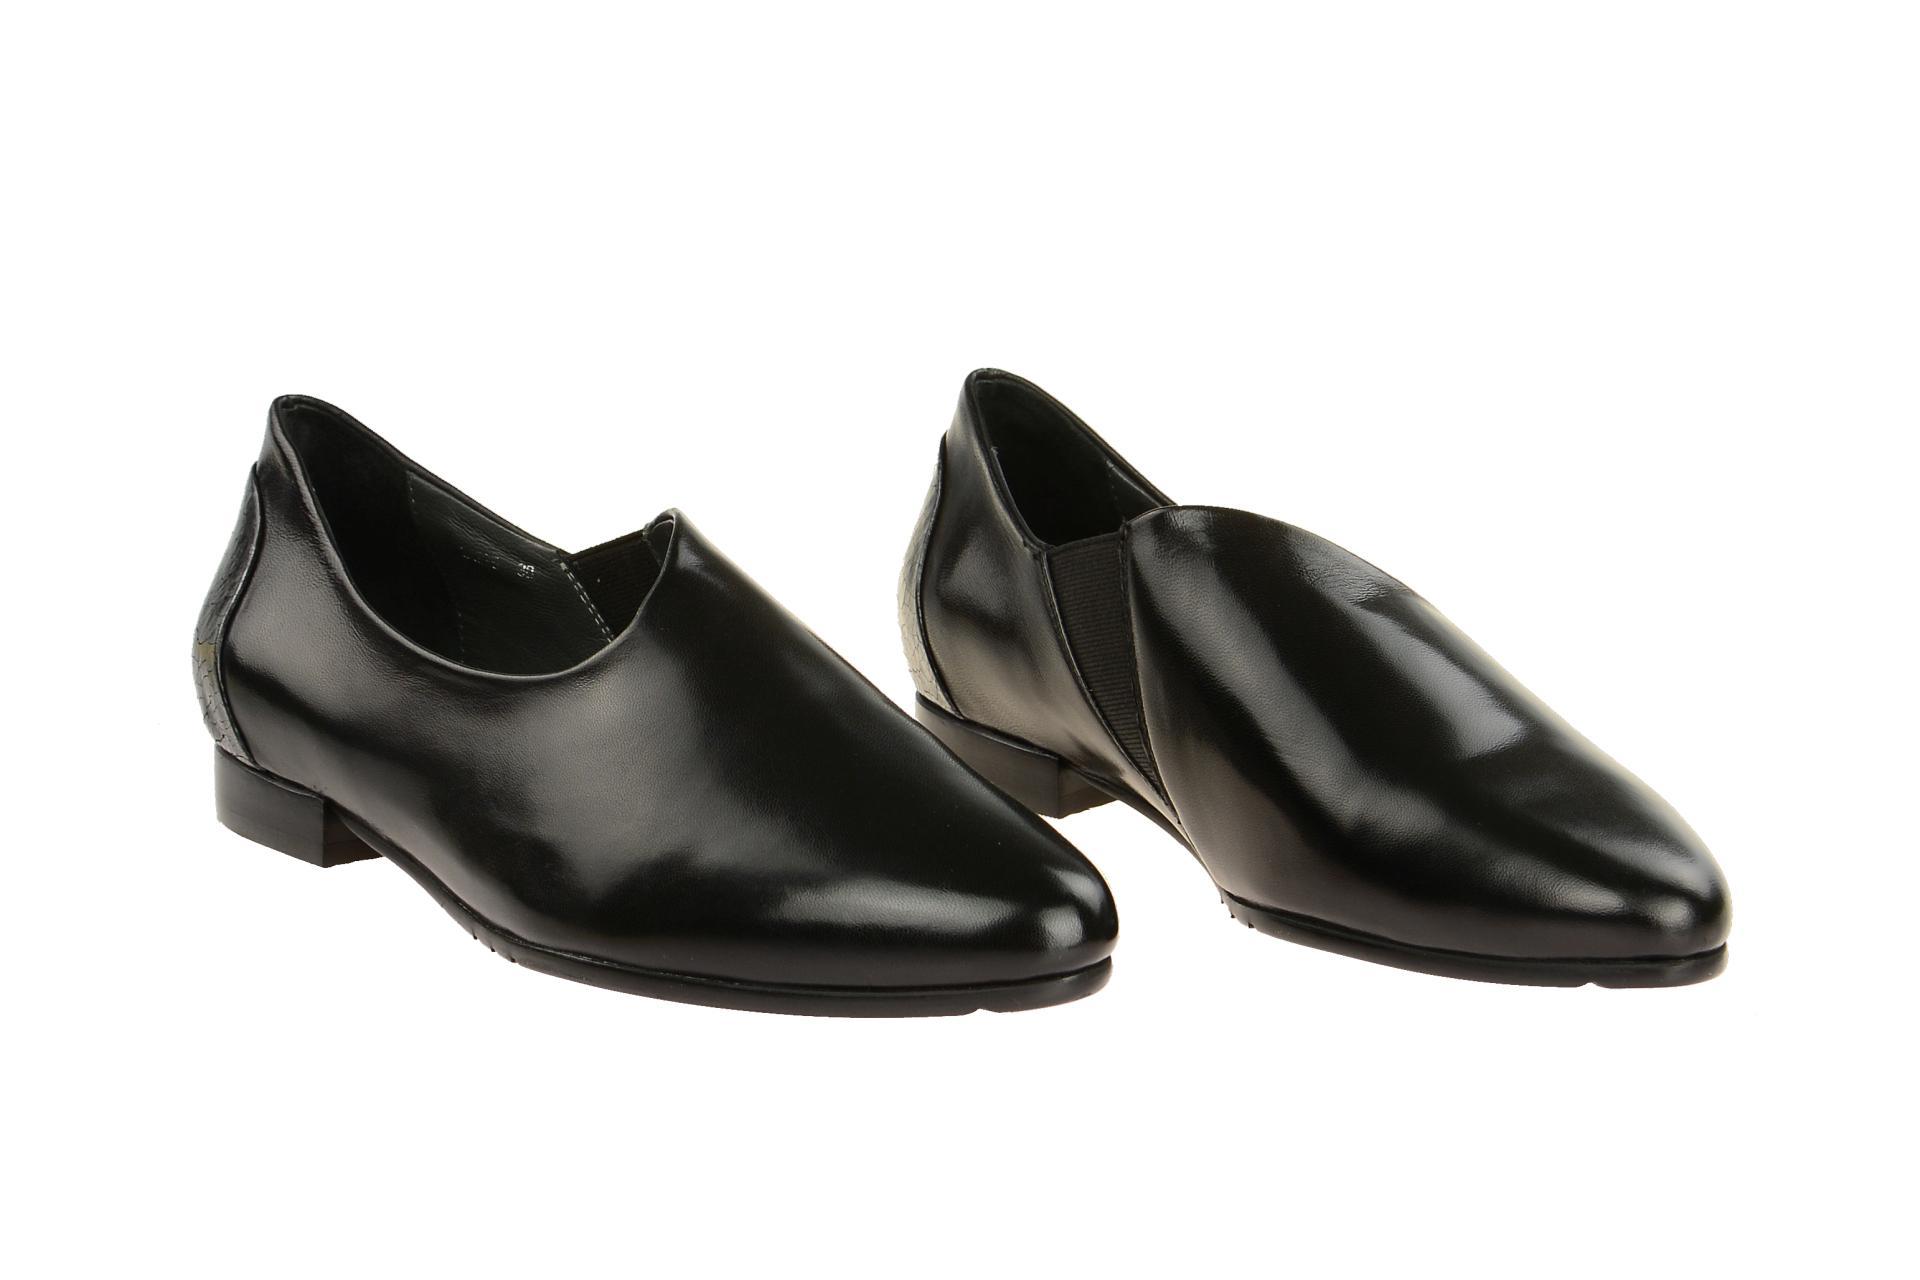 san francisco f7c9e 9bbd3 Details zu Everybody Schuhe 34335 schwarz Damenschuhe elegante Slipper  34335G2399 nero NEU